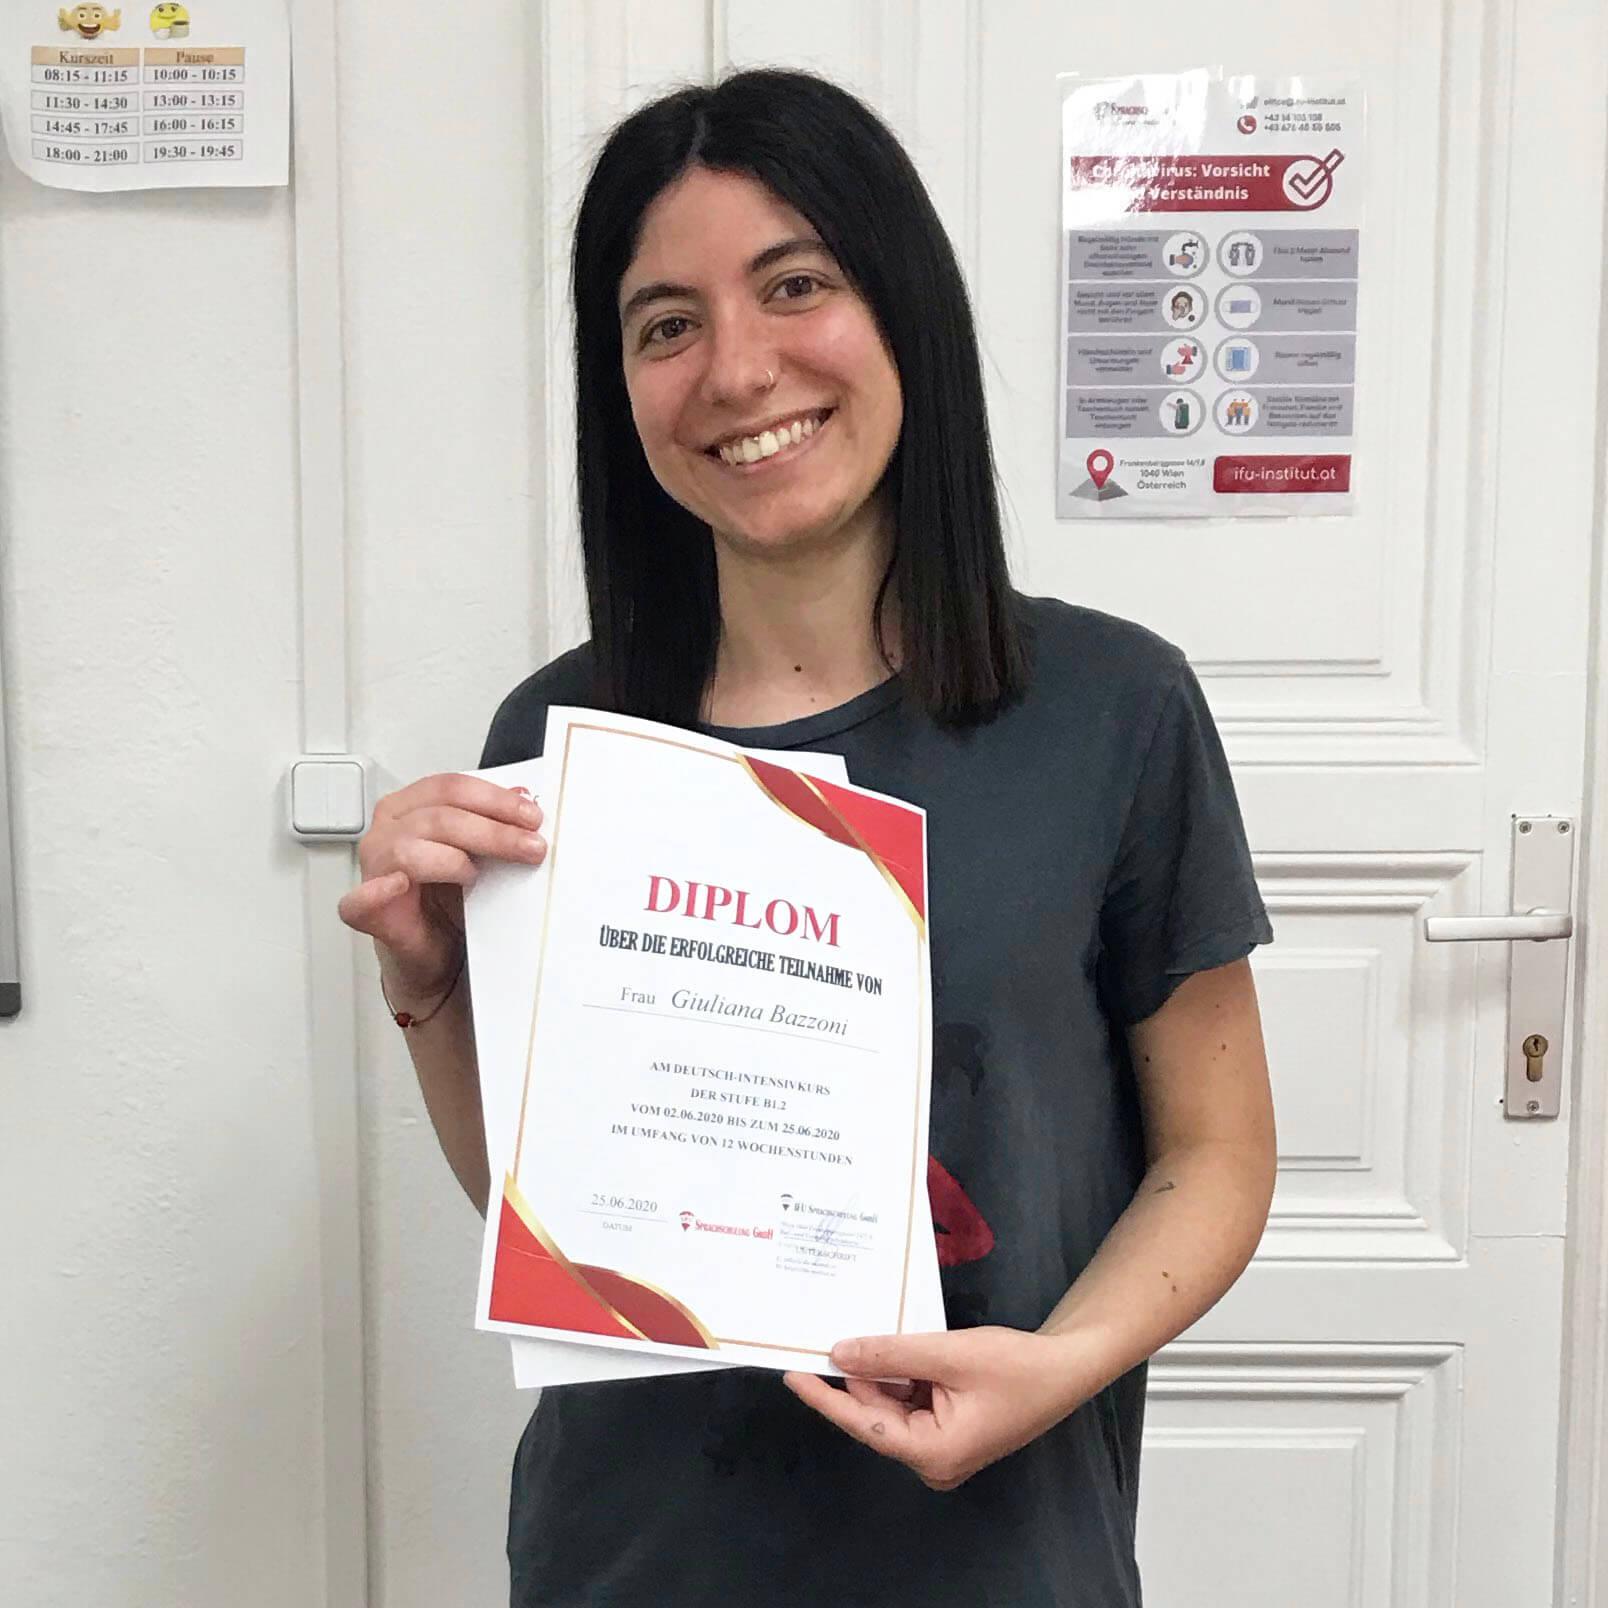 Giuliana Bazzoni; Italien; B1.2;